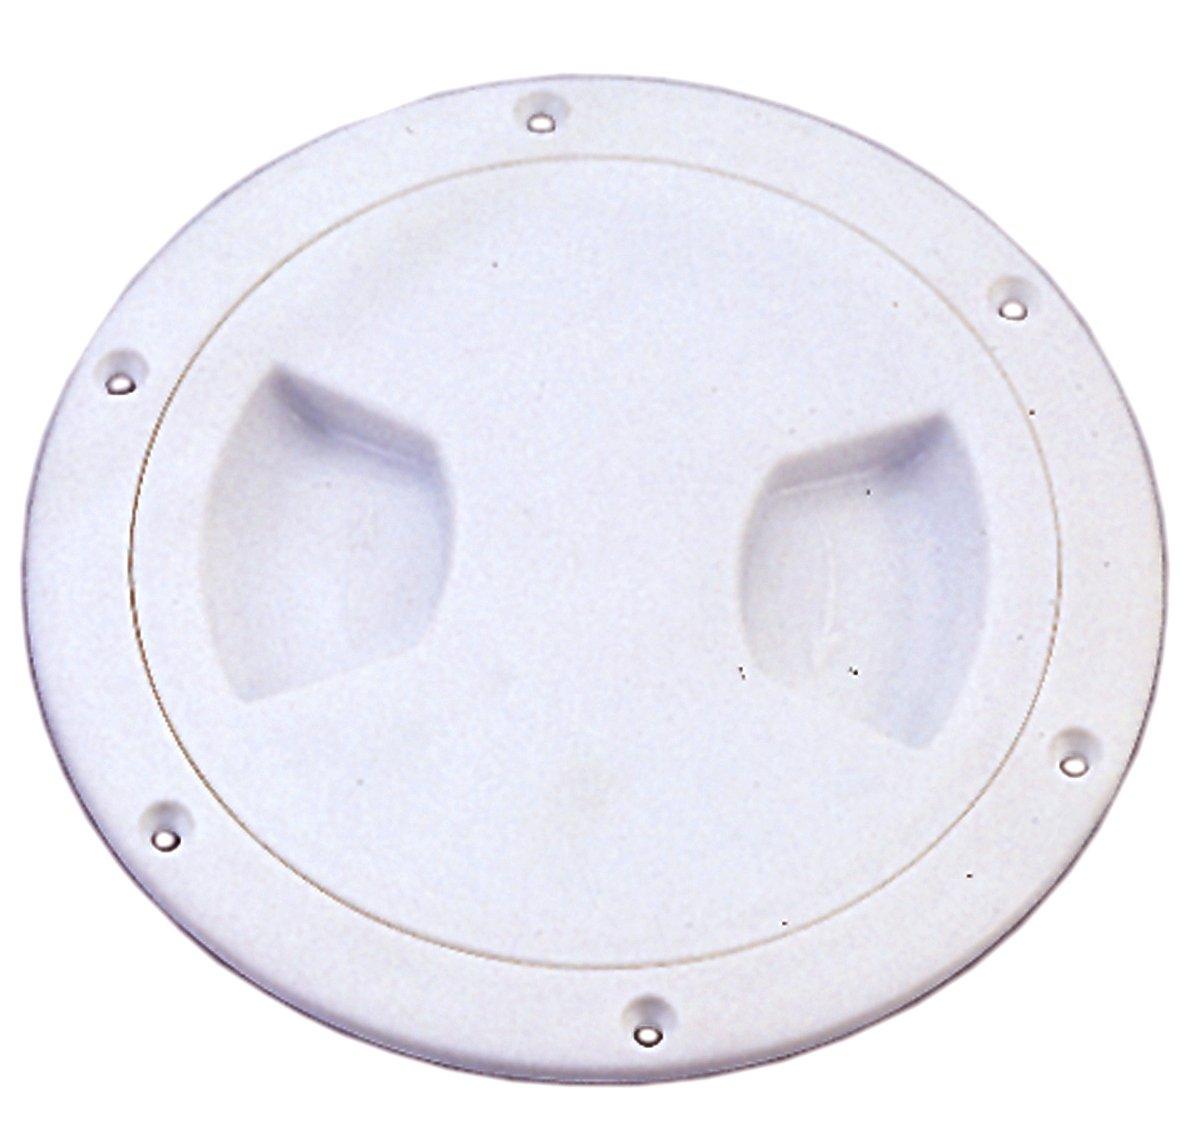 4 inch Unified Marine Inc 50031054 SeaSense Waterproof Deck Plate